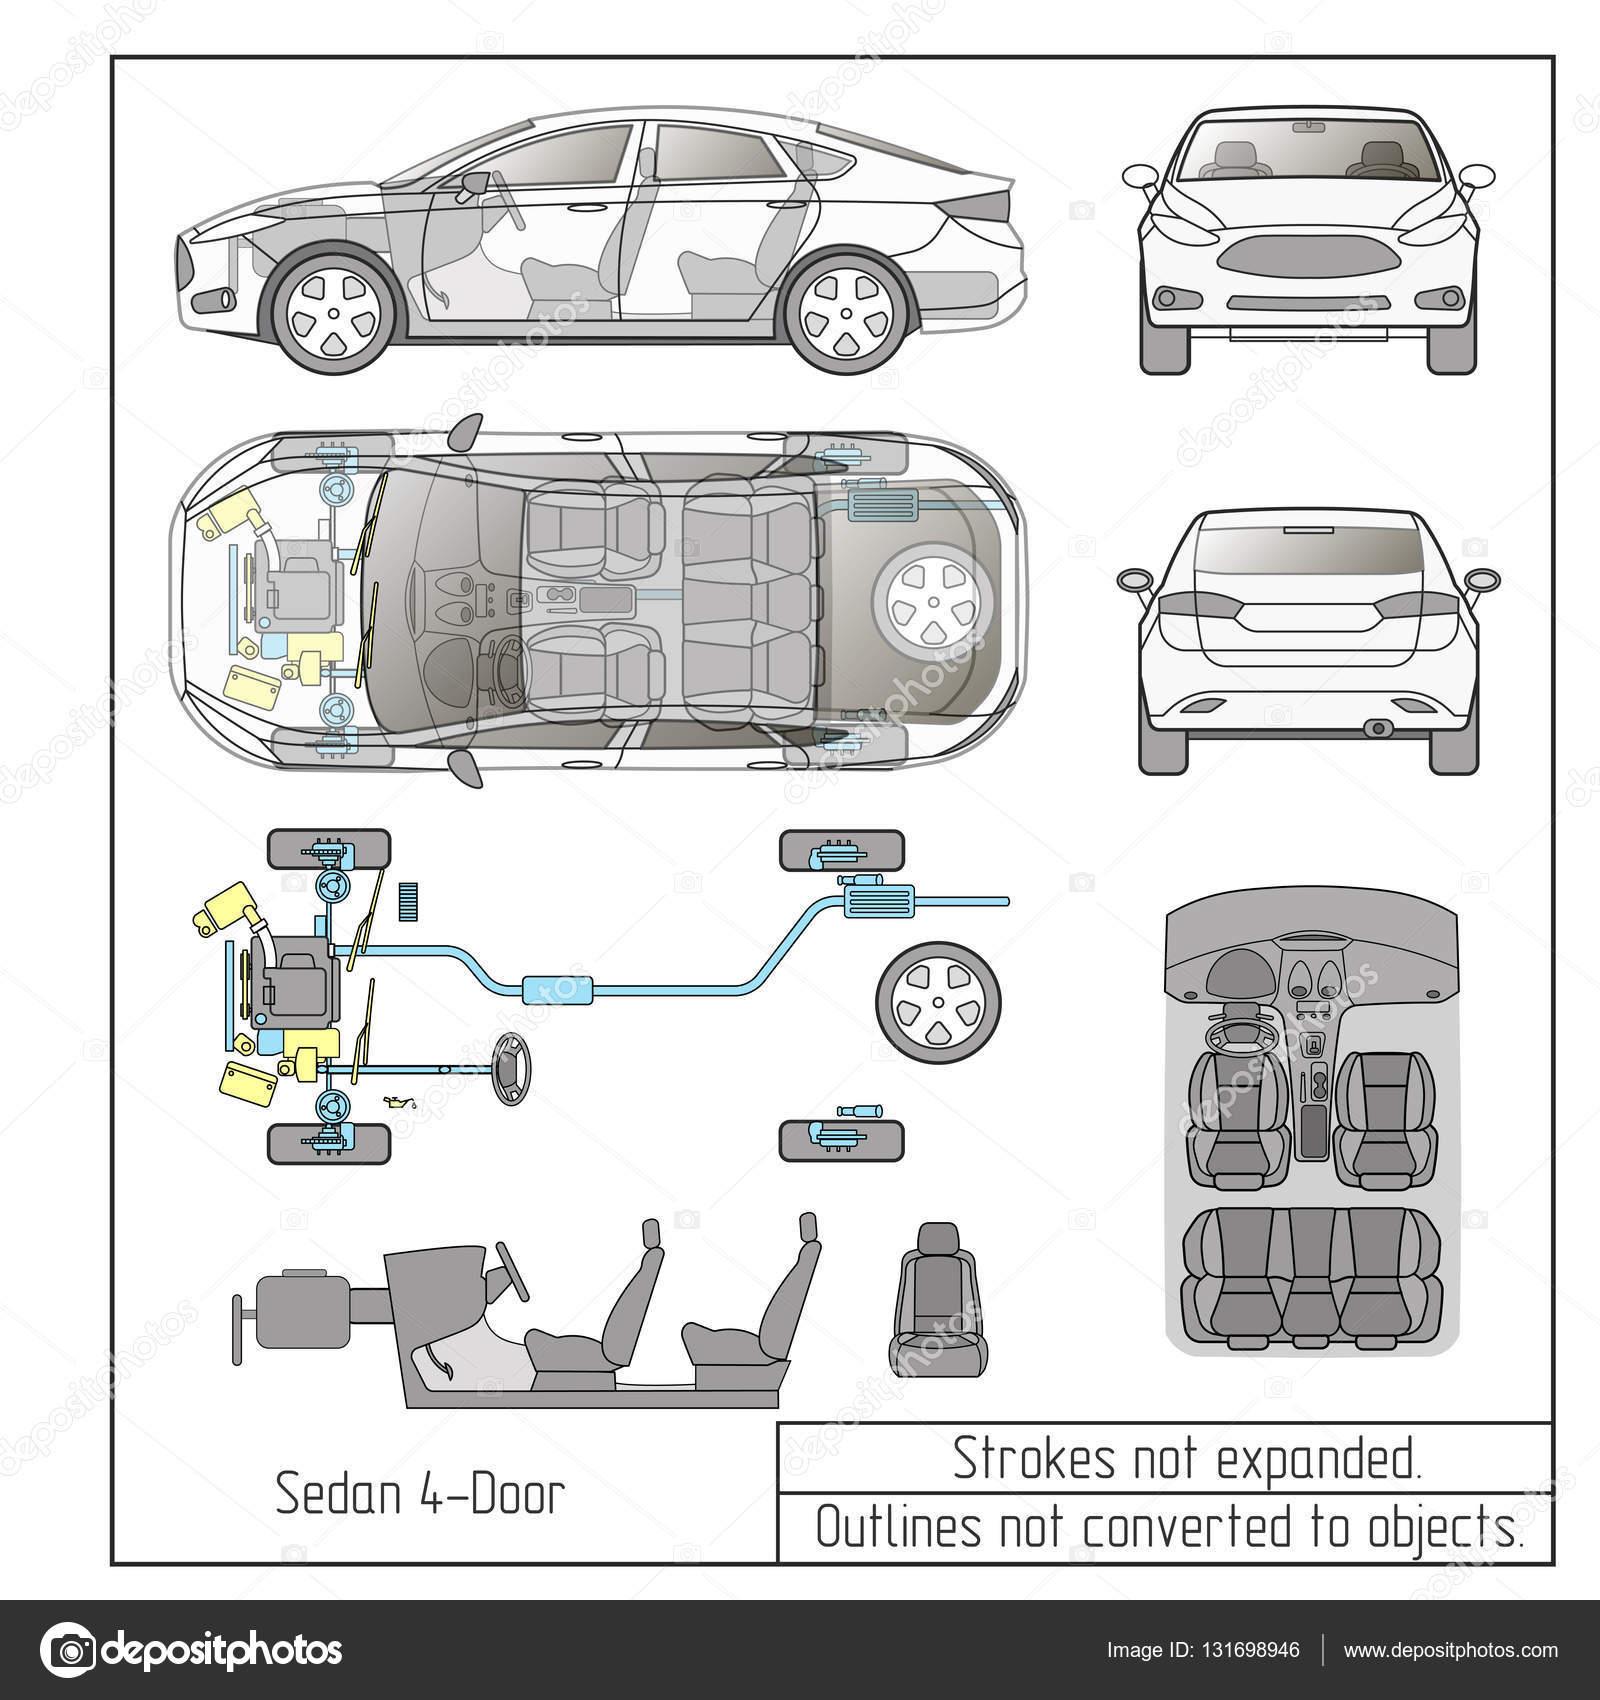 Isuzu Ascender 2004 Diagram Schematics Data Wiring Diagrams Fuse Box Toyota Echo Elsalvadorla Radio Wire